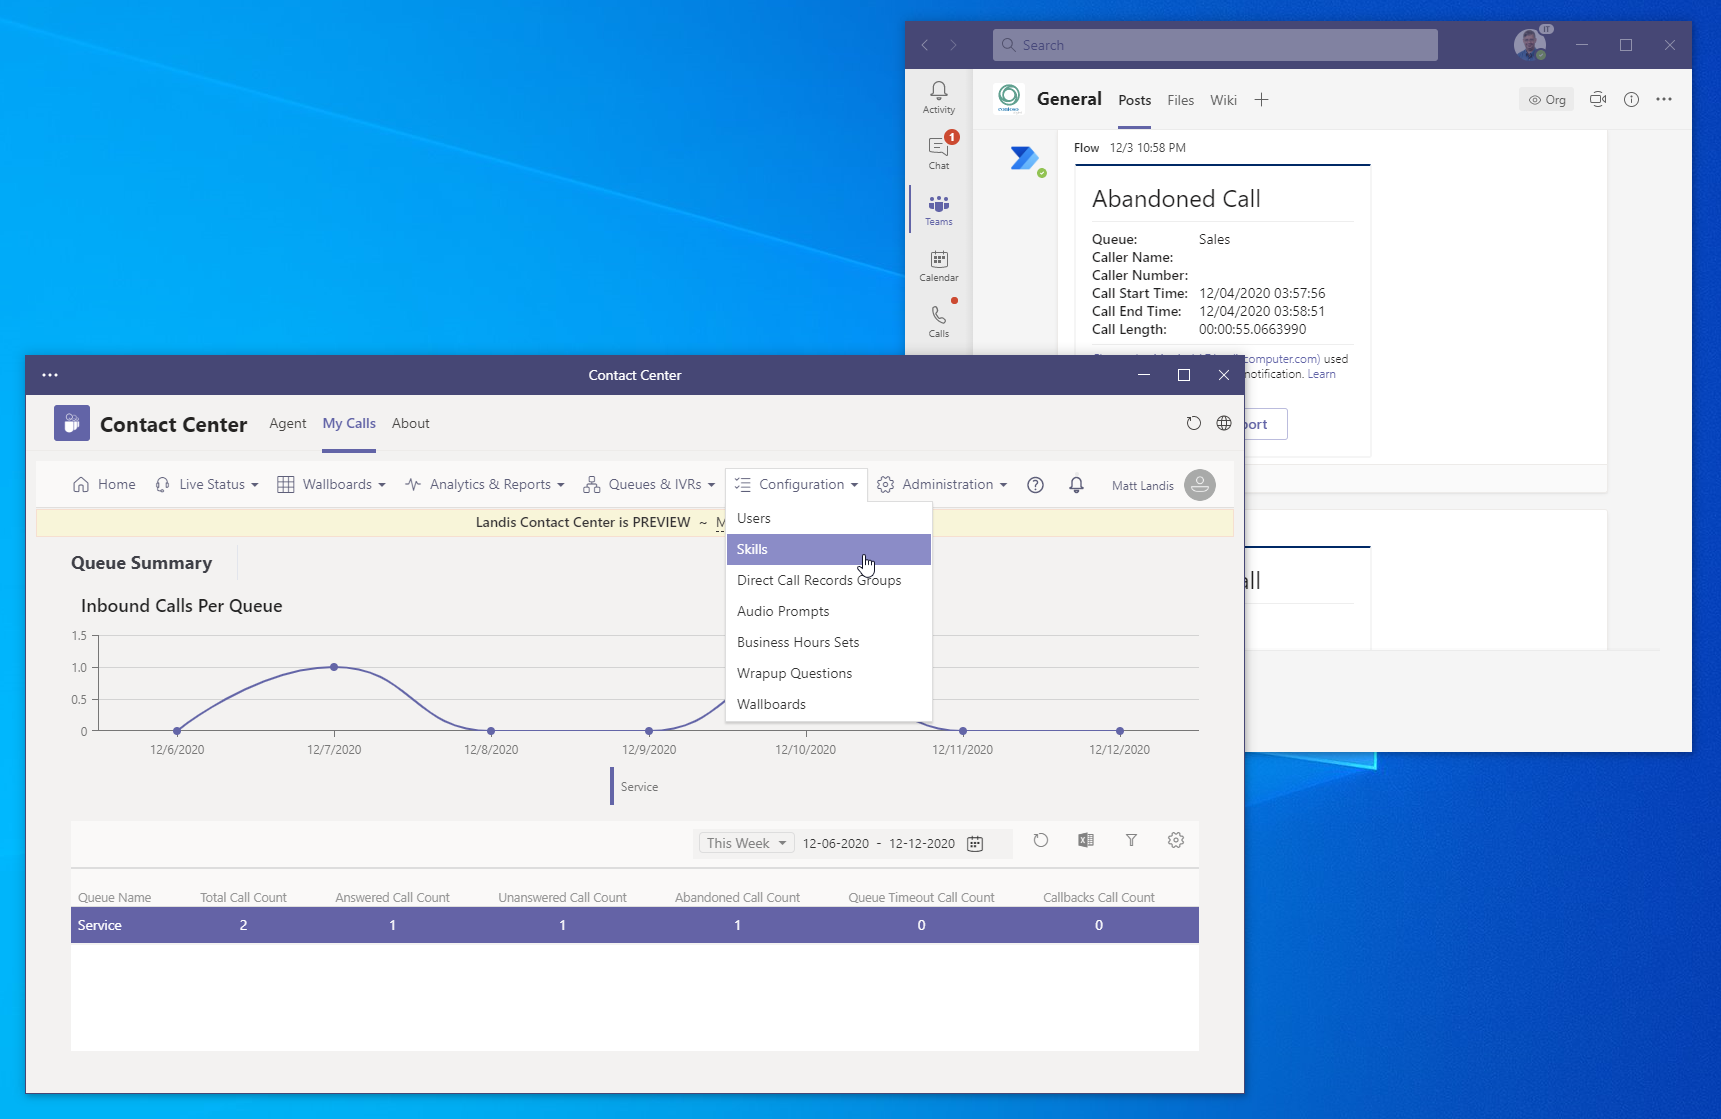 Microsoft Teams App Pop Out Landis Contact Cente